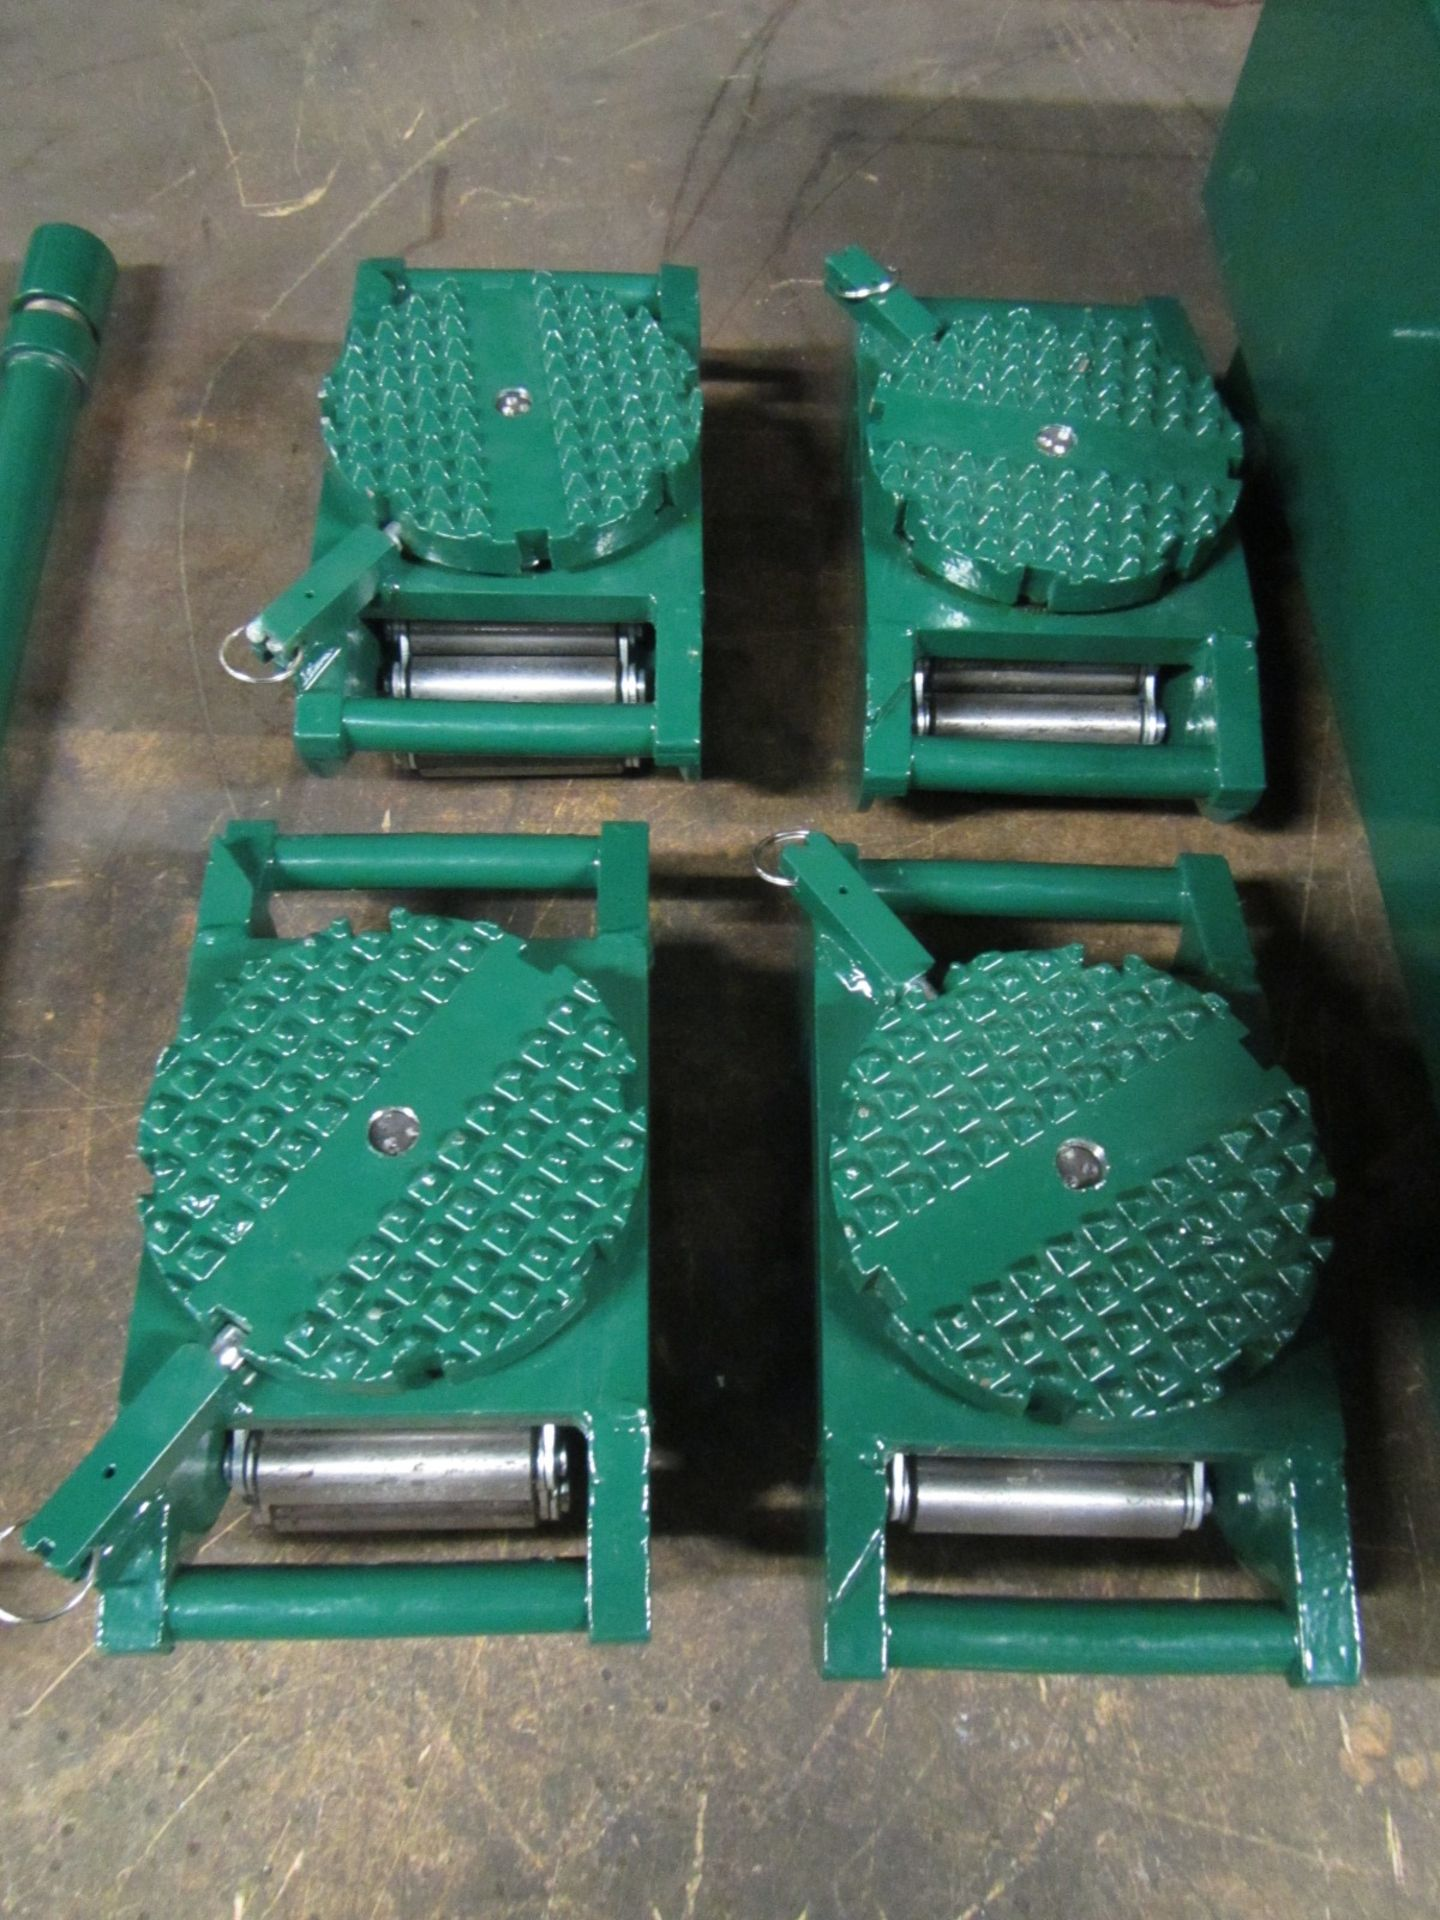 Hilman Type Roller Set Machinery moving skates - 40 Ton Deluxe Kit - 4 x 10 ton units - Image 2 of 2